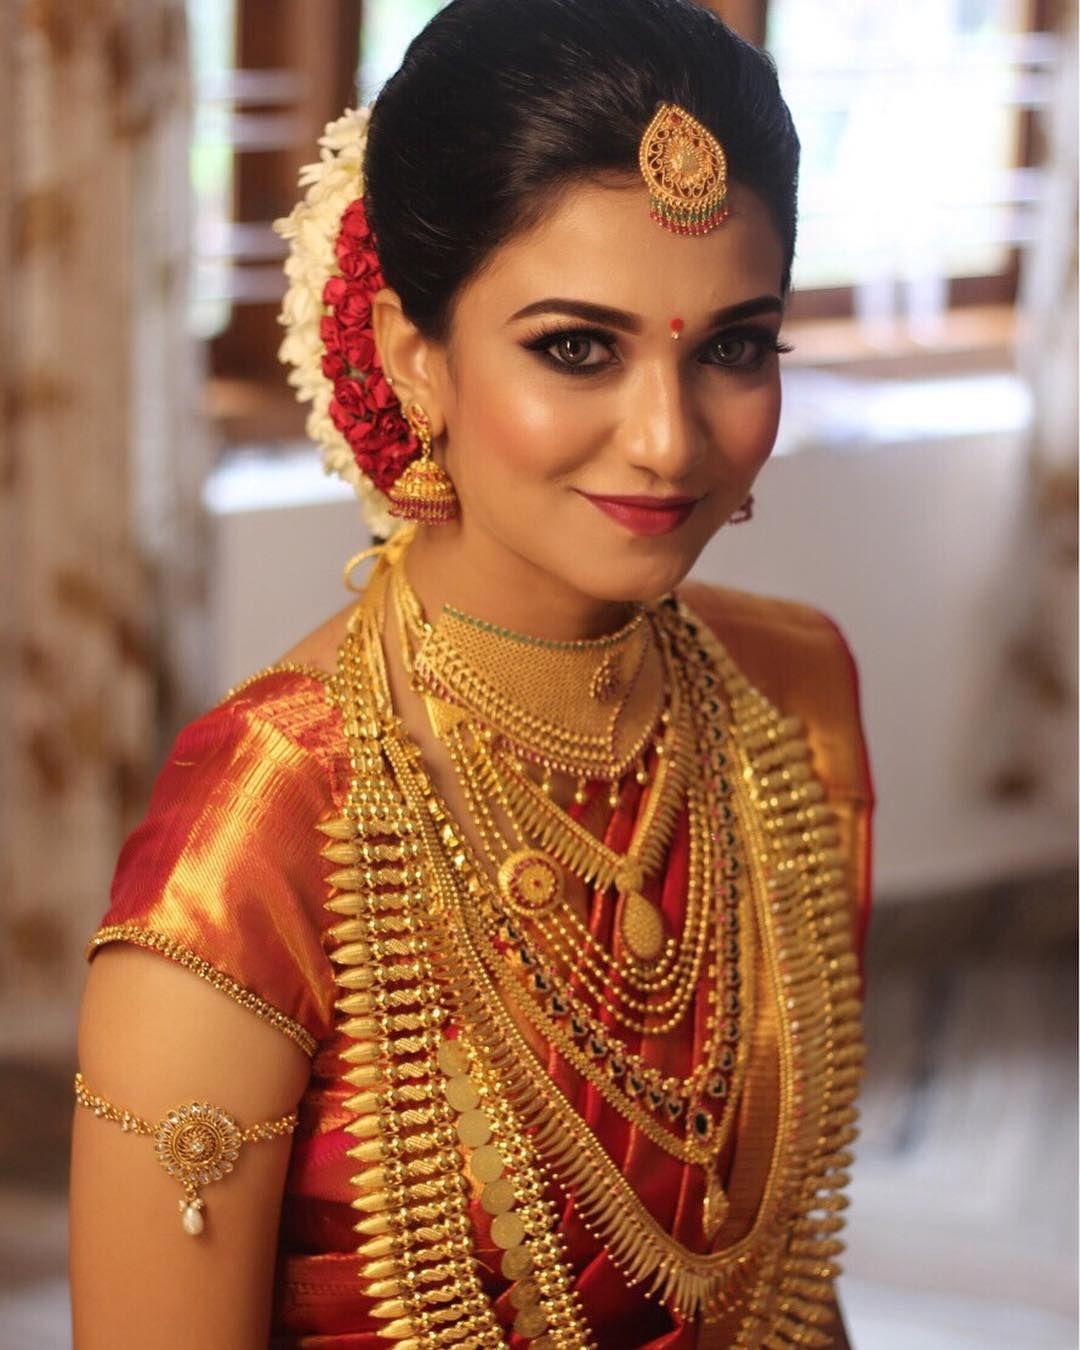 #Repost @cinema__hotspot ・・・ #bride #brides #gorgeousbride #prettybride #stunningbride #cutebride #mac #makeup #makeupforever #mua…